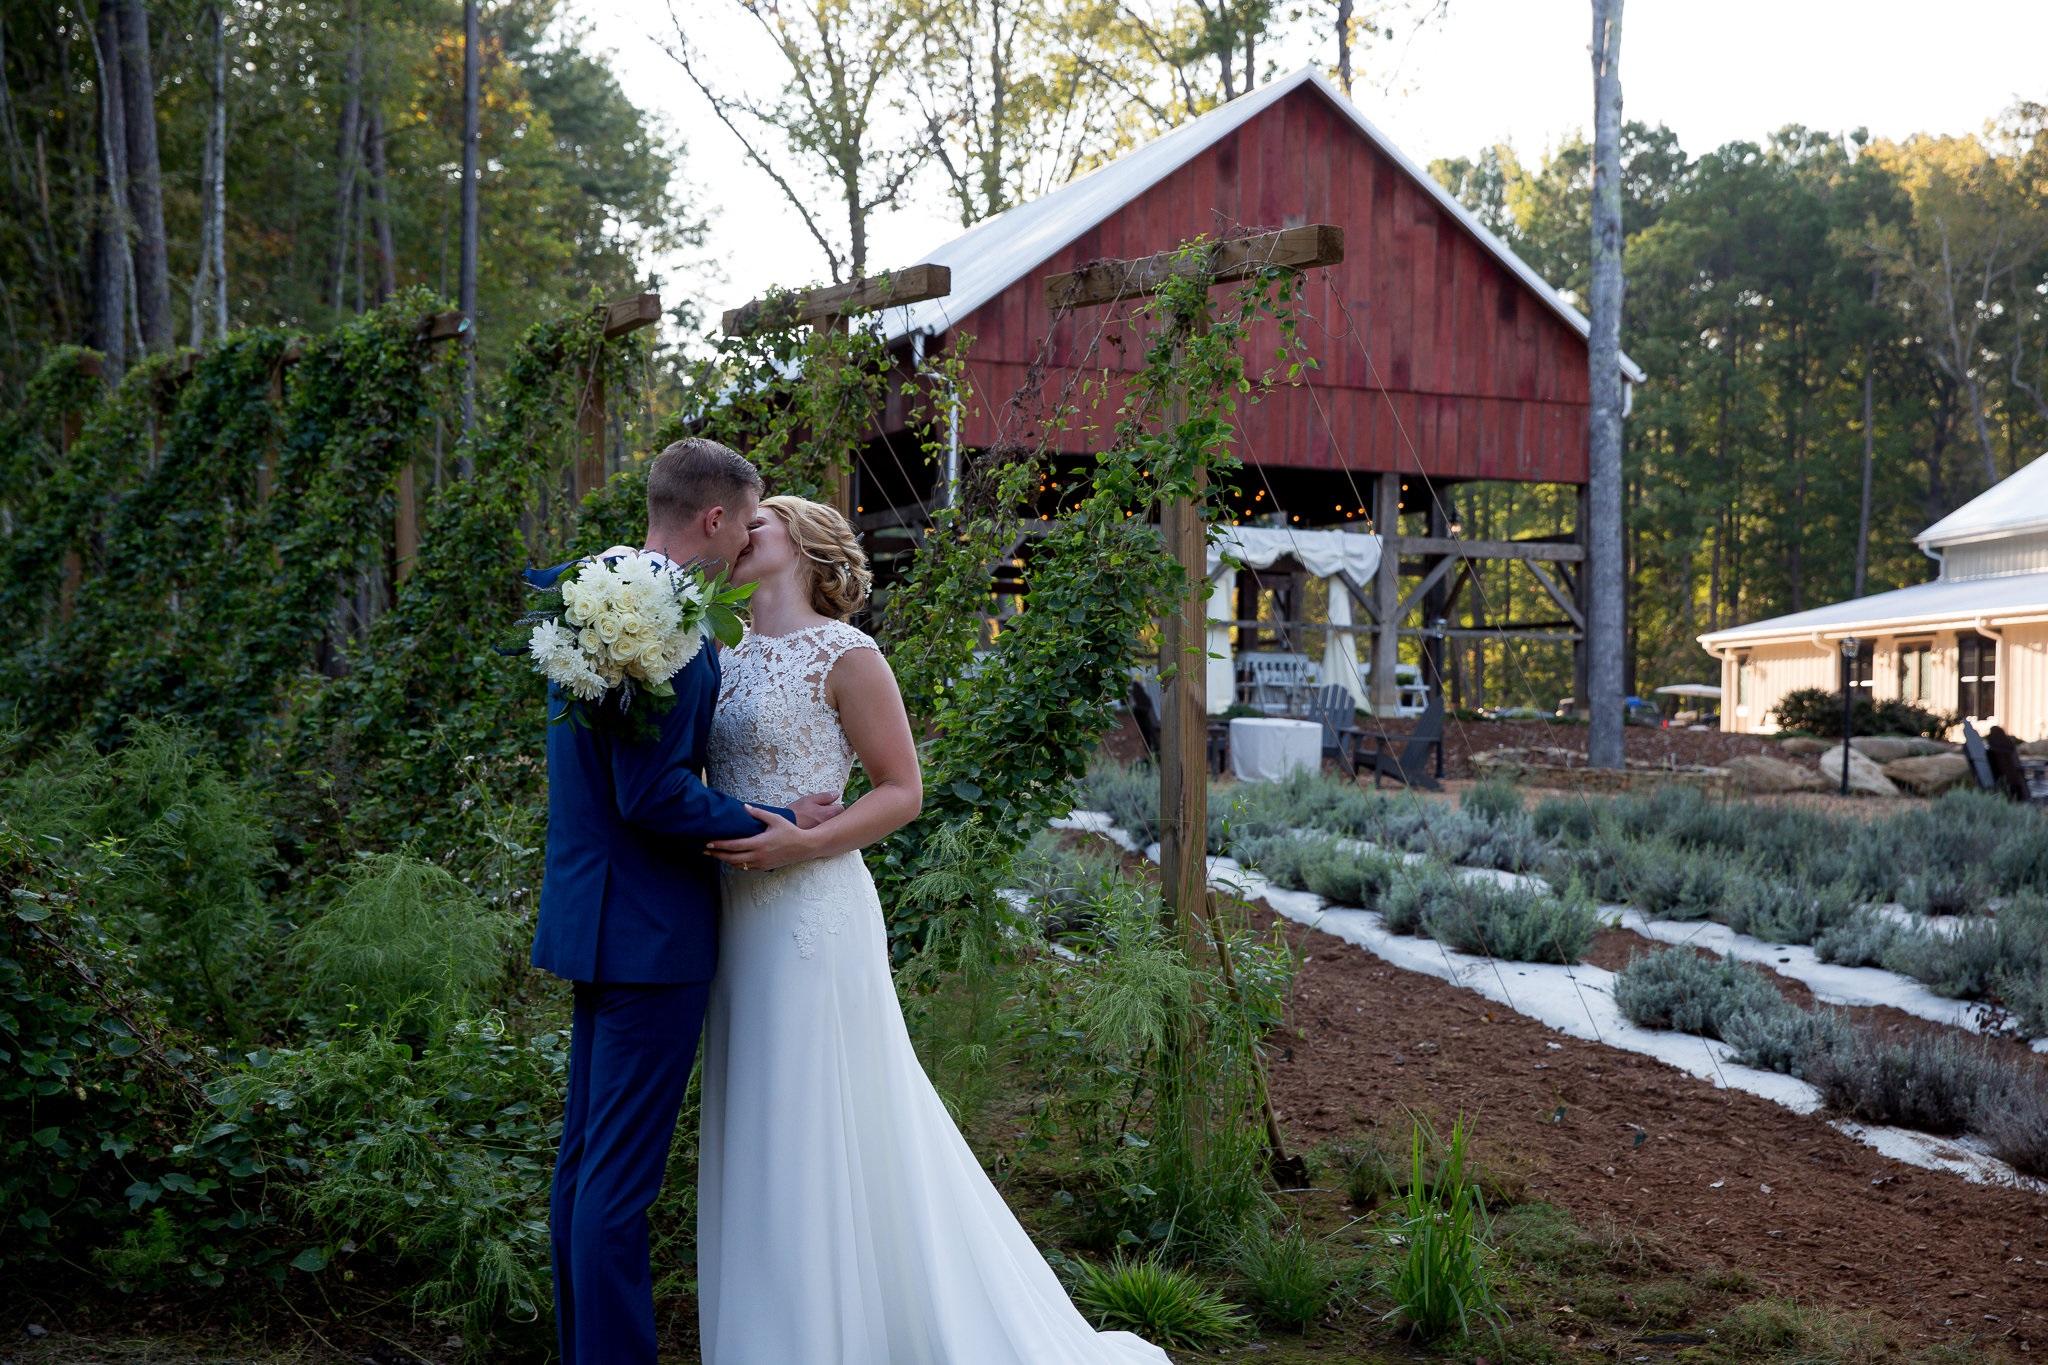 LAVENDER OAKS FARM Chapel Hill NC LAVENDER FARM